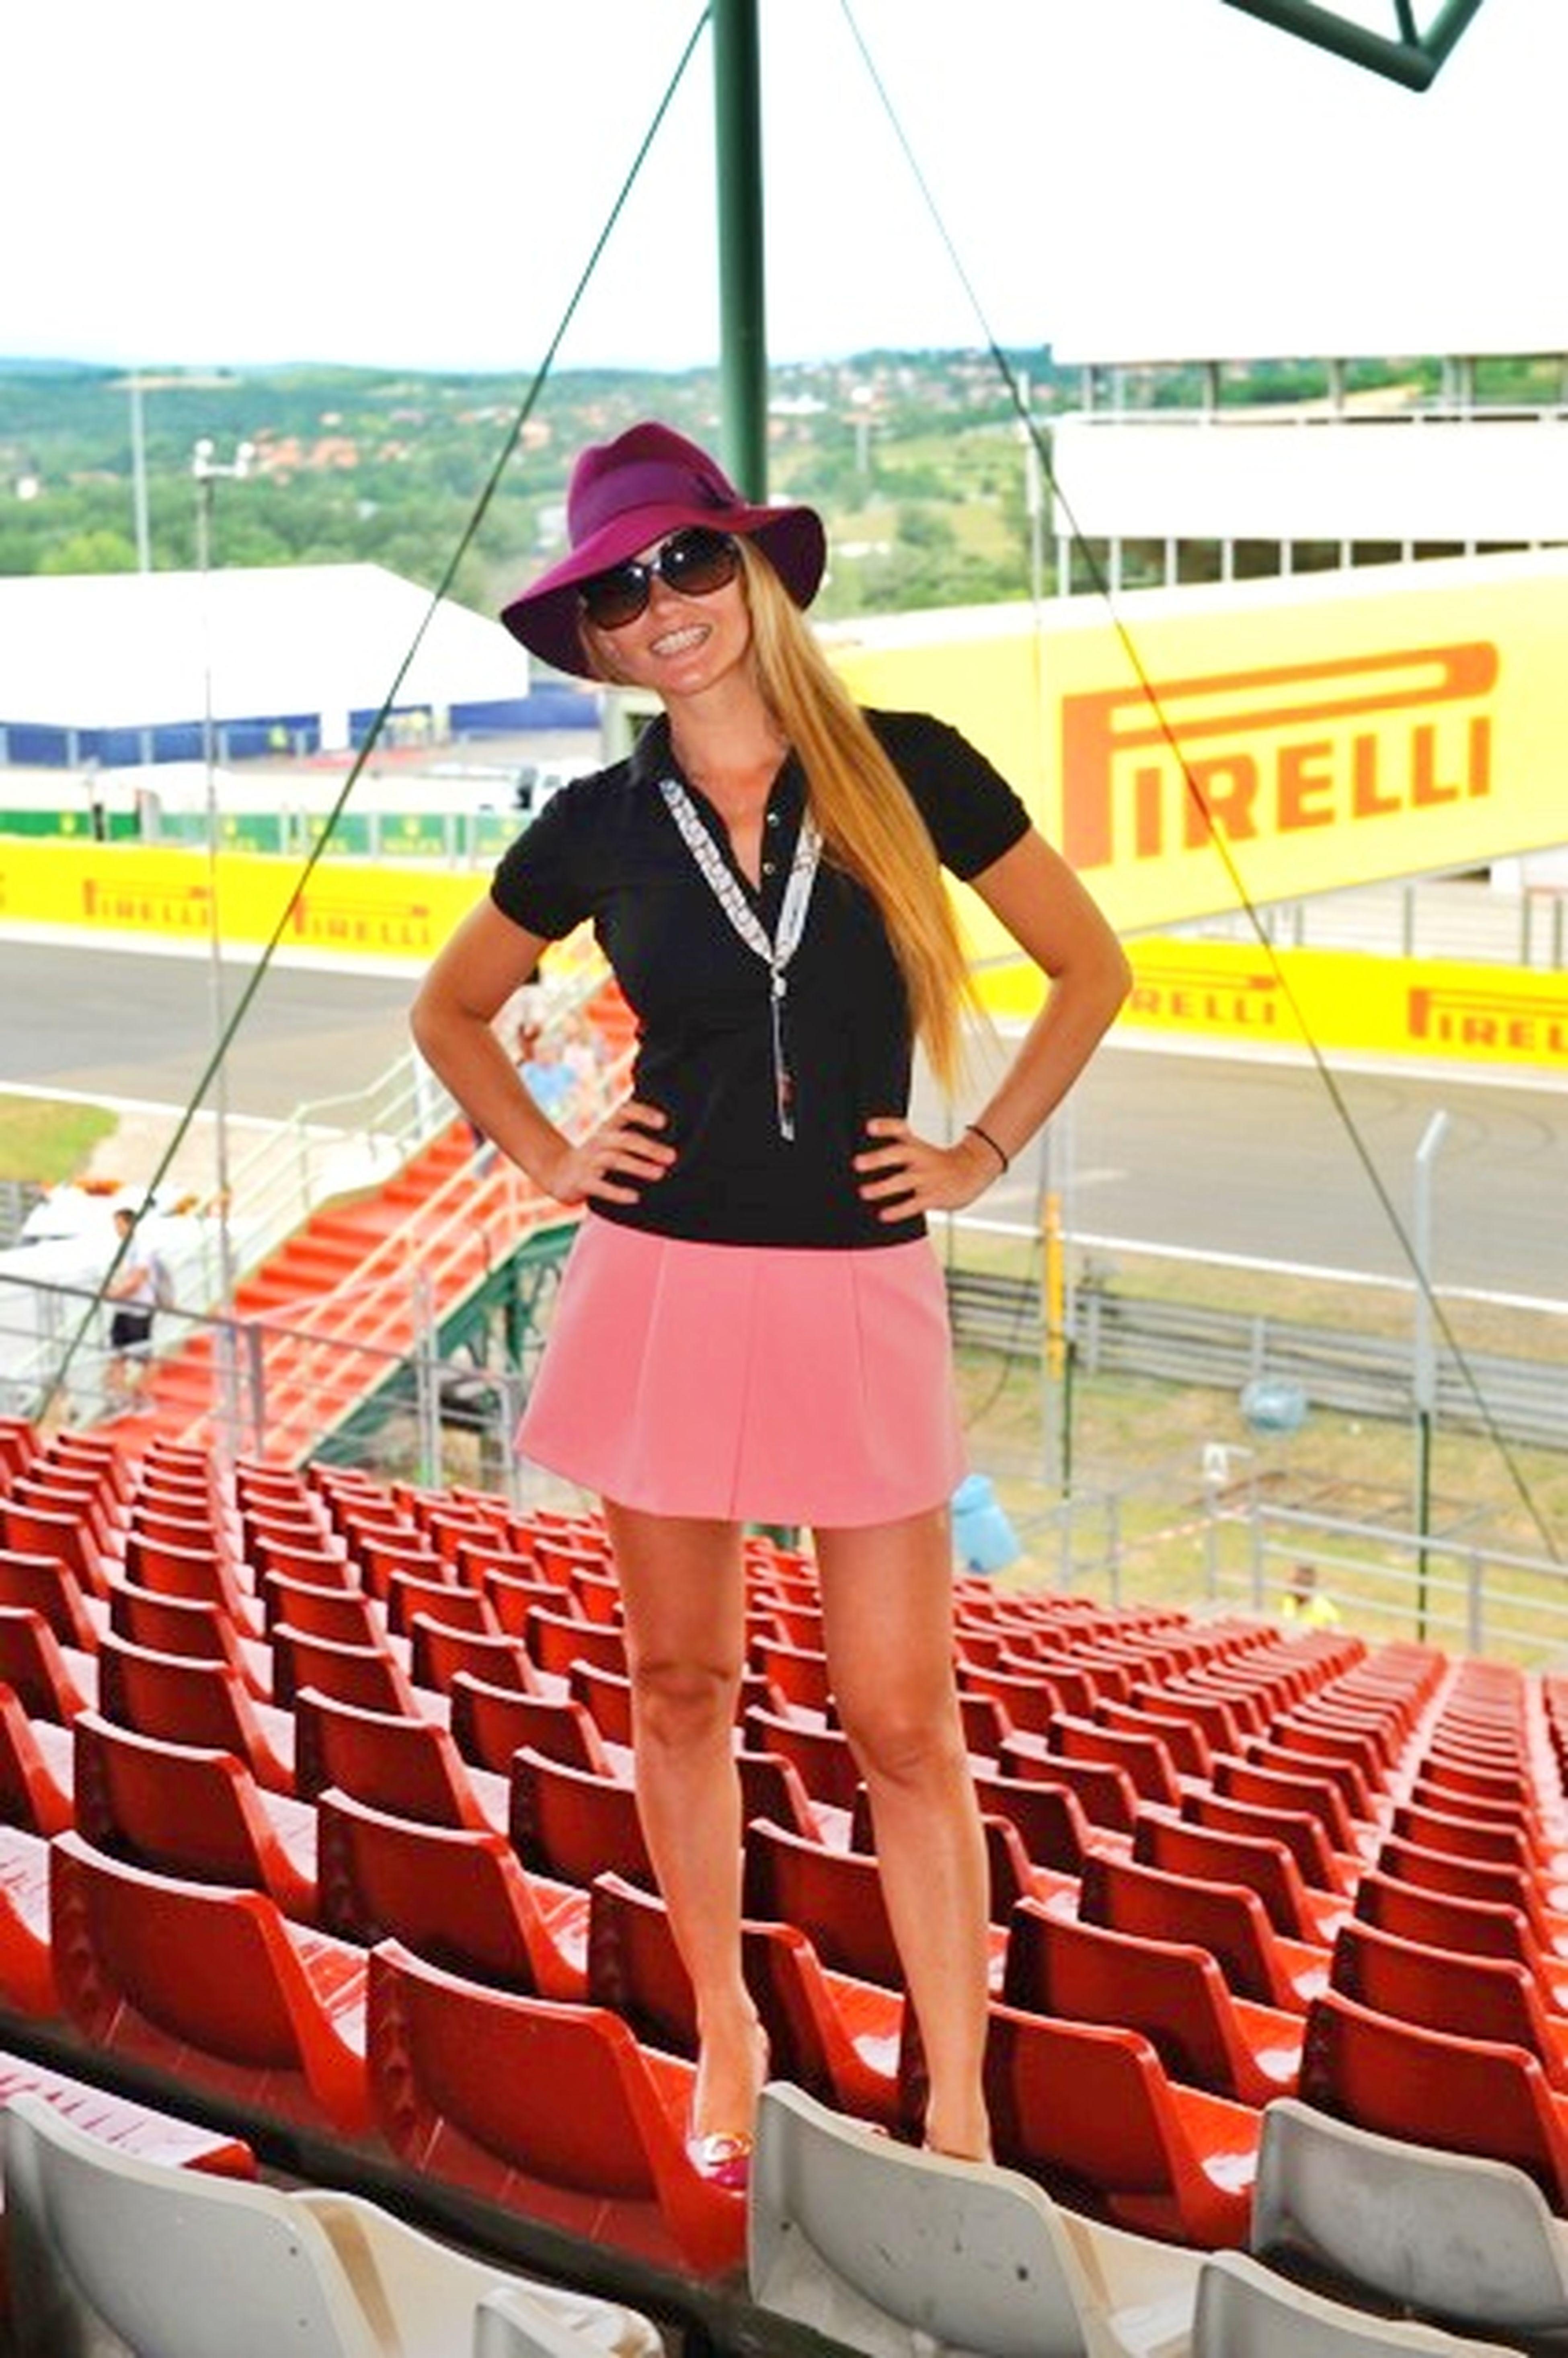 Formula1 Hungarian GP Formula 1 Hungarian Grand Prix Racing Cars Hungaroring Photoshooting 😍😌😊